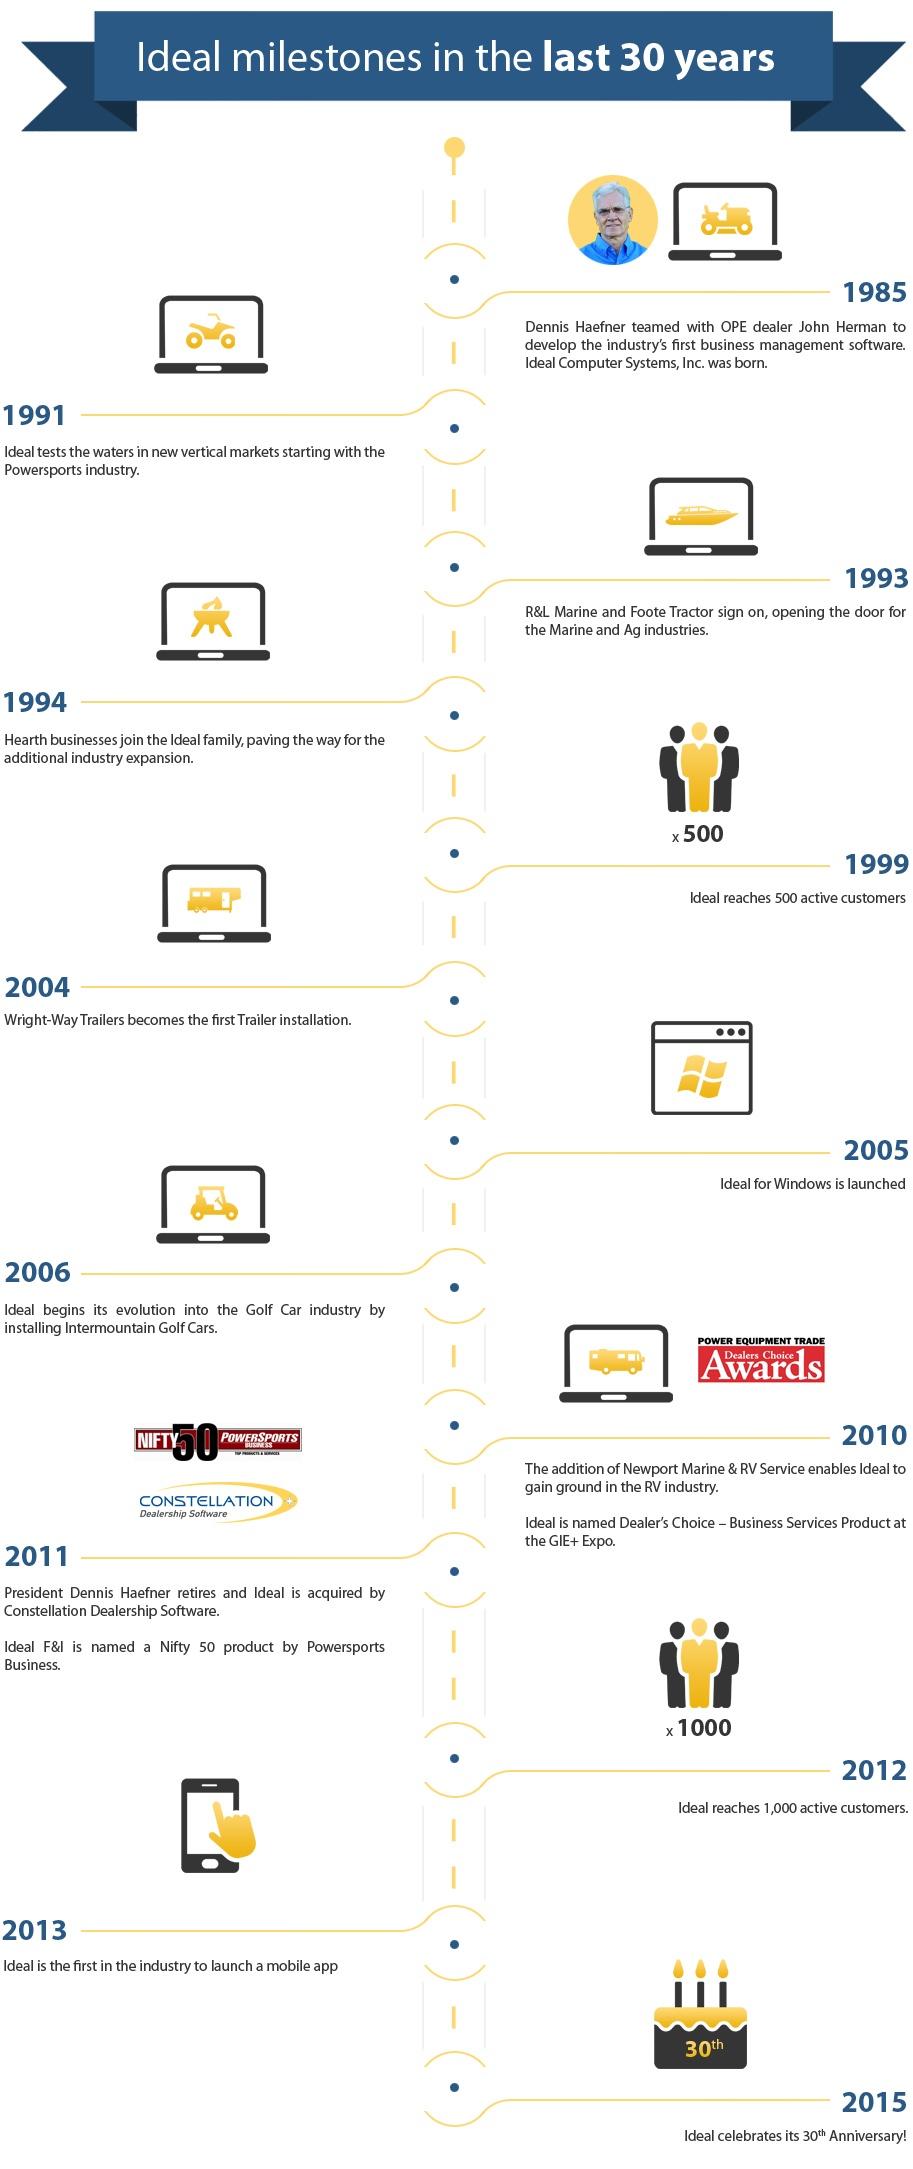 Ideal milestones in the last 30 years